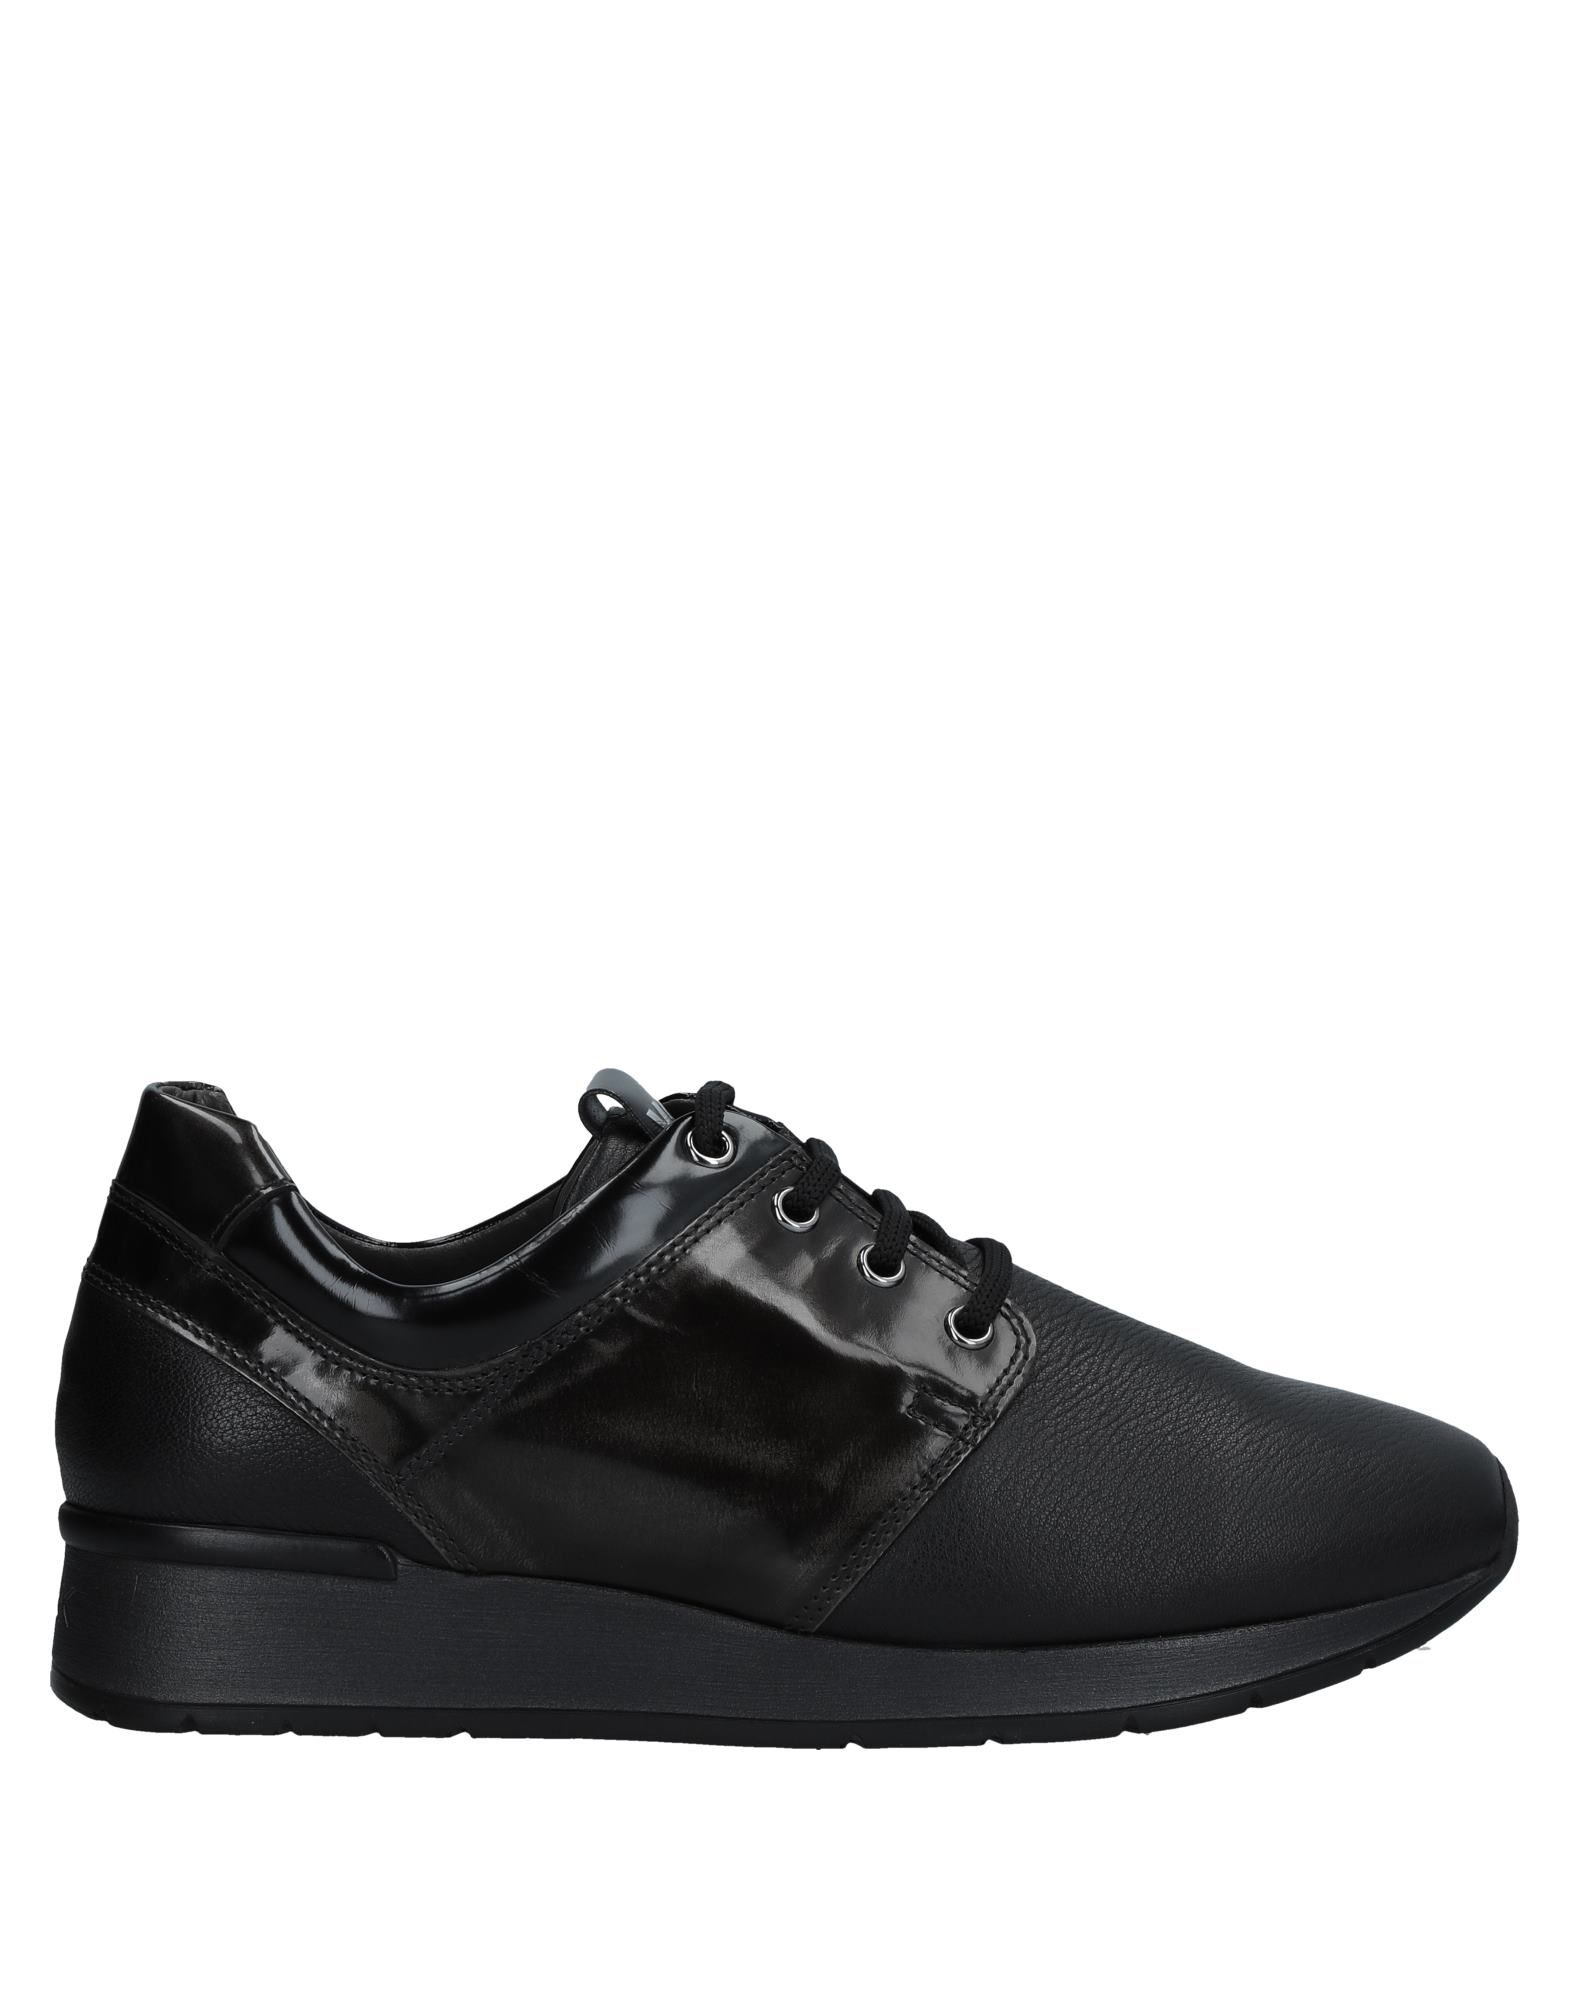 Walk By Melluso Sneakers Damen  11535069SC Gute Qualität beliebte Schuhe